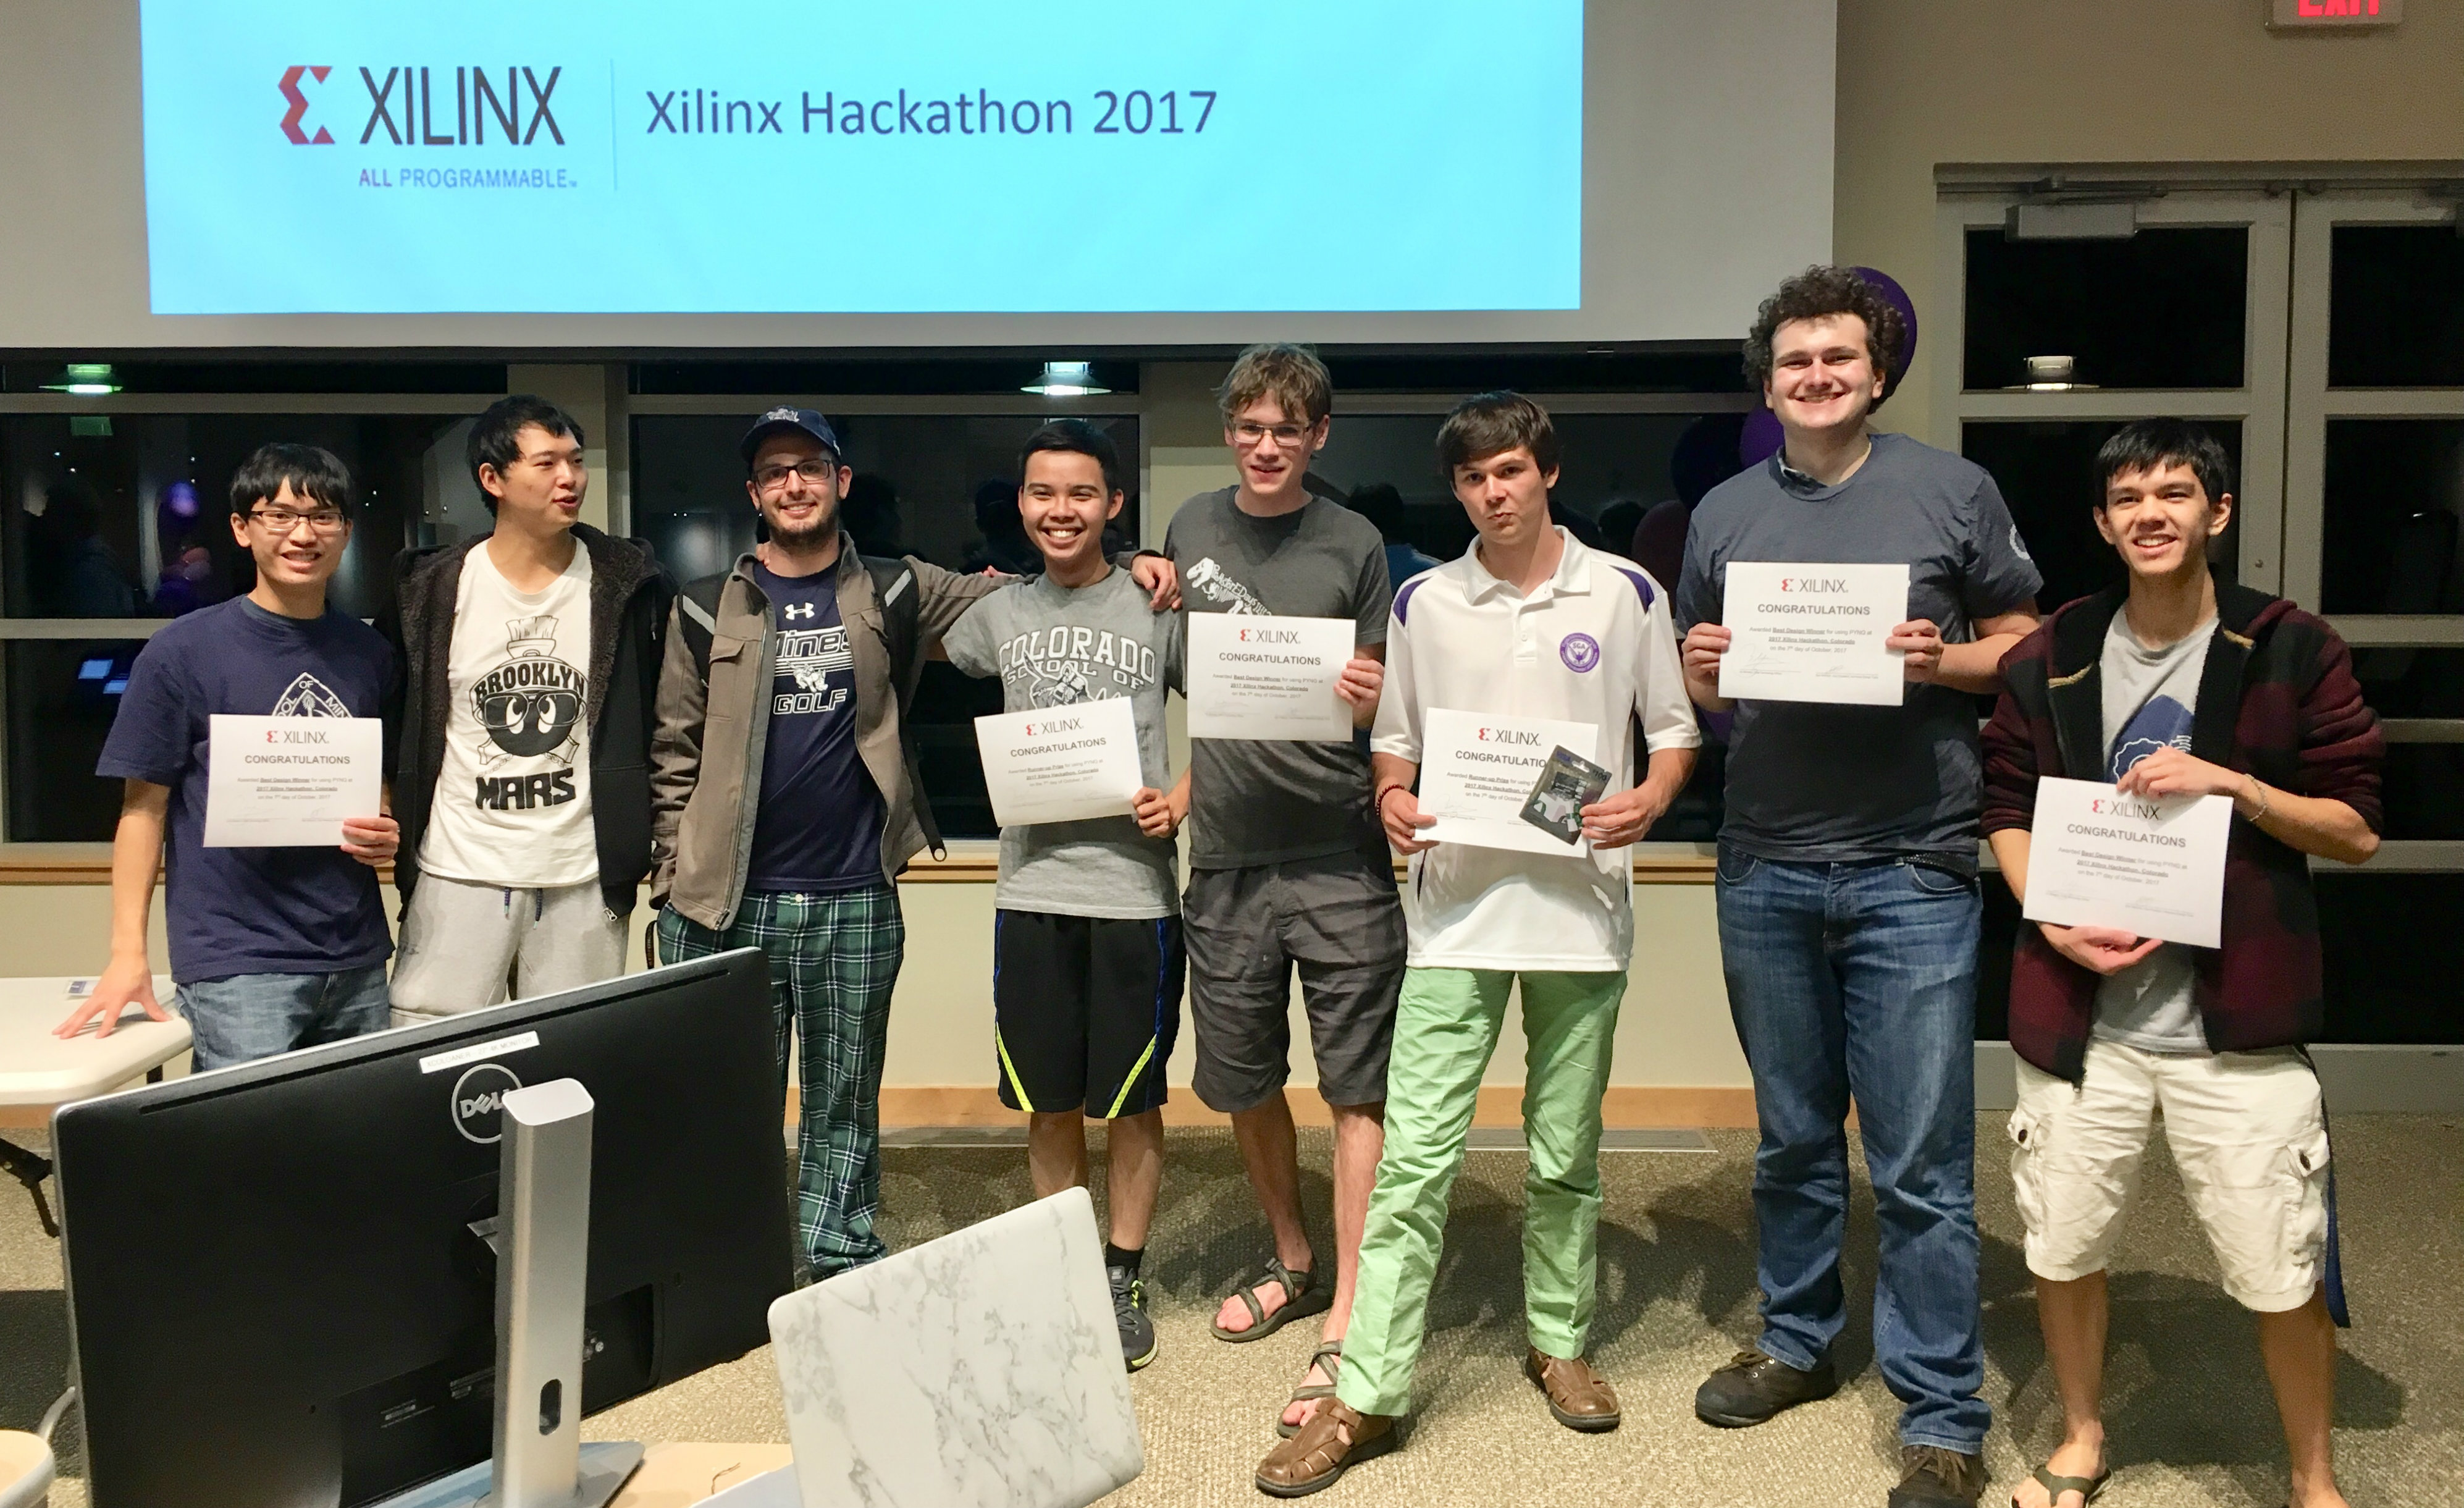 Colorado School of Mines students after winning the Xilinx Hackathon